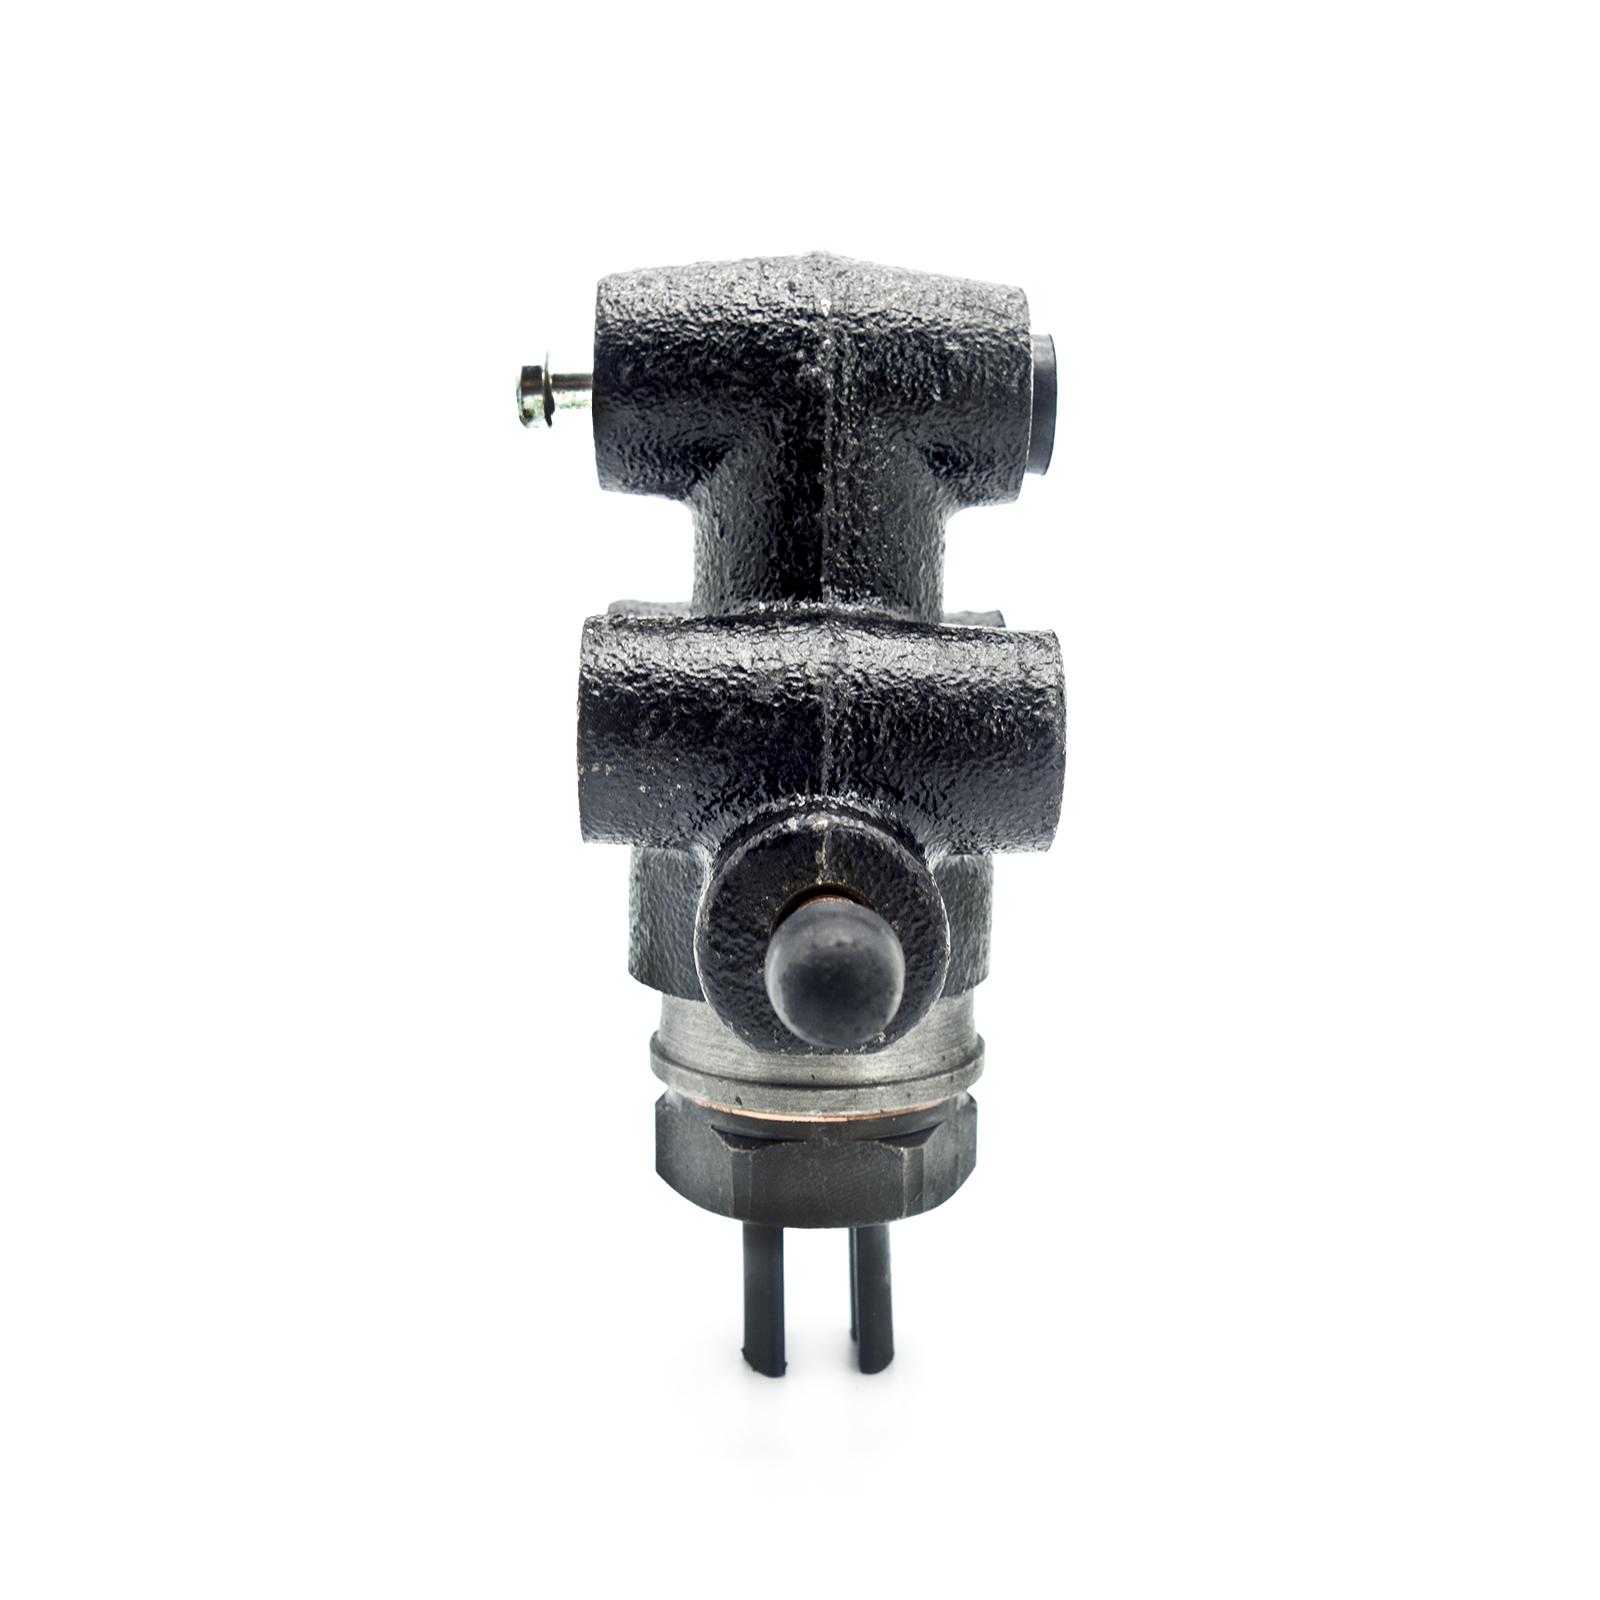 Brake Load Sensing Proportioning Valve for Toyota 2001-2004 Tacoma 47910-27081